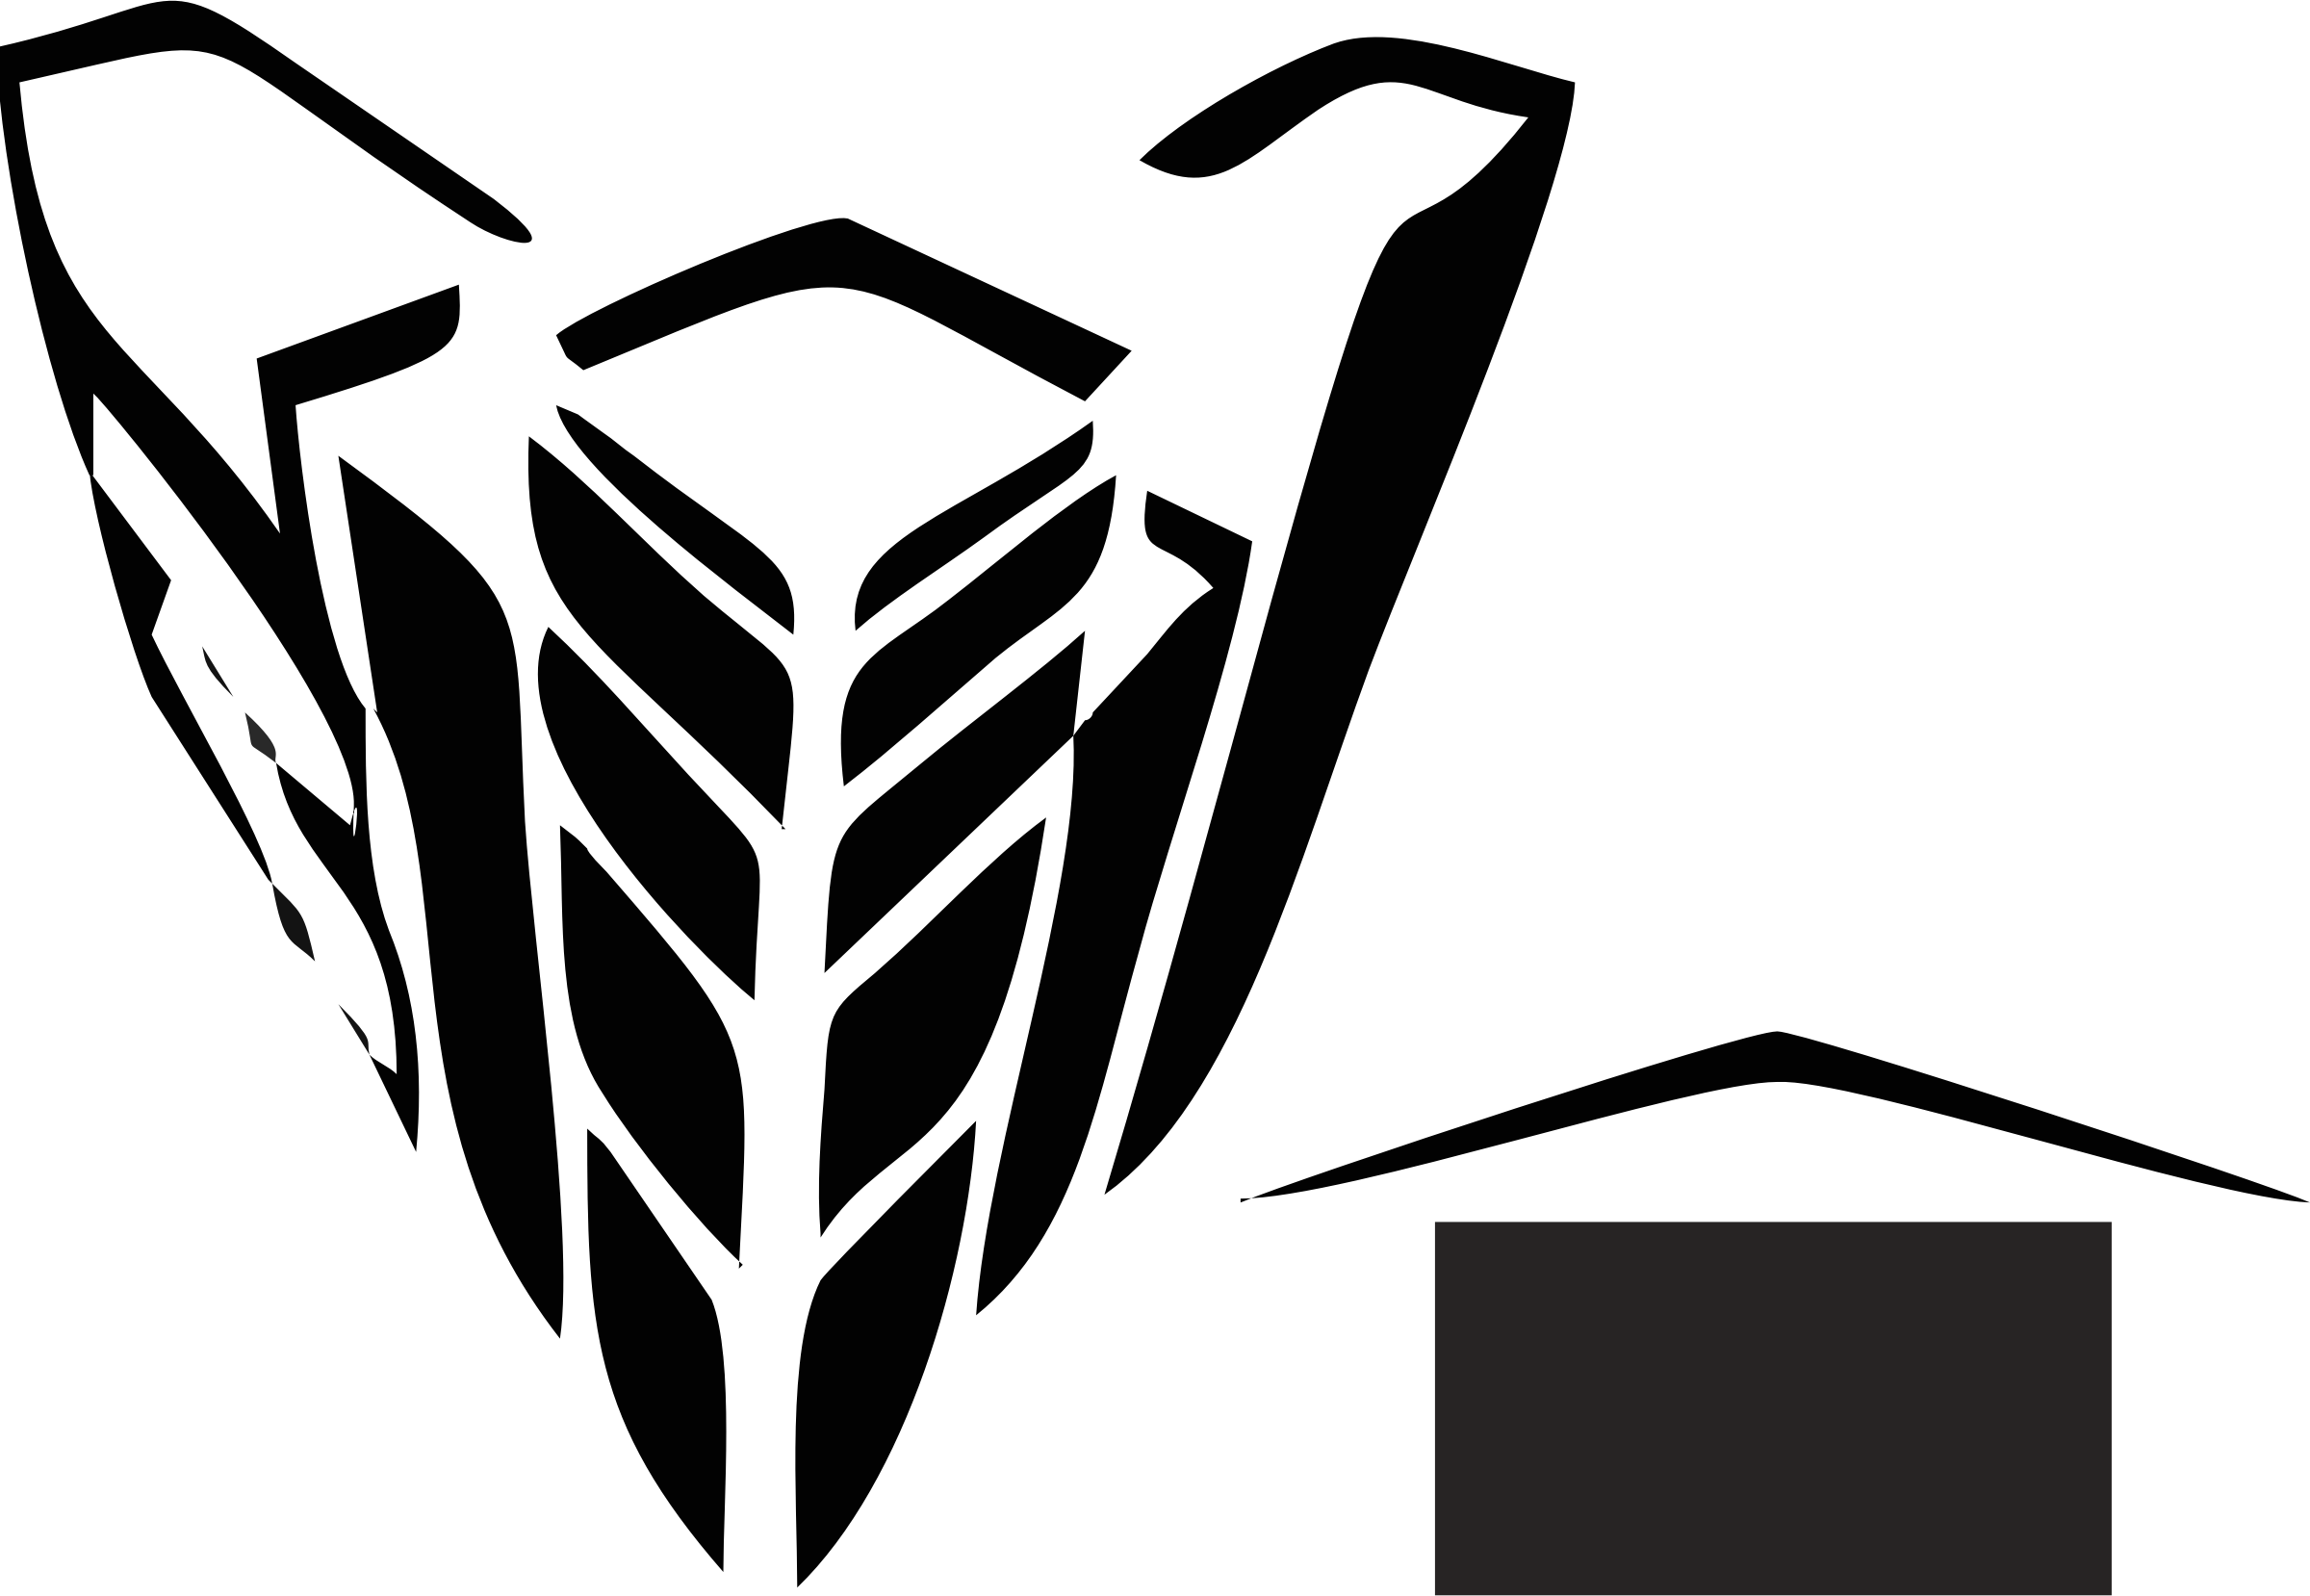 Facebook logo clipart clip art free download Logo Building Black and white Clip art - Durga Maa 2400*1658 ... clip art free download